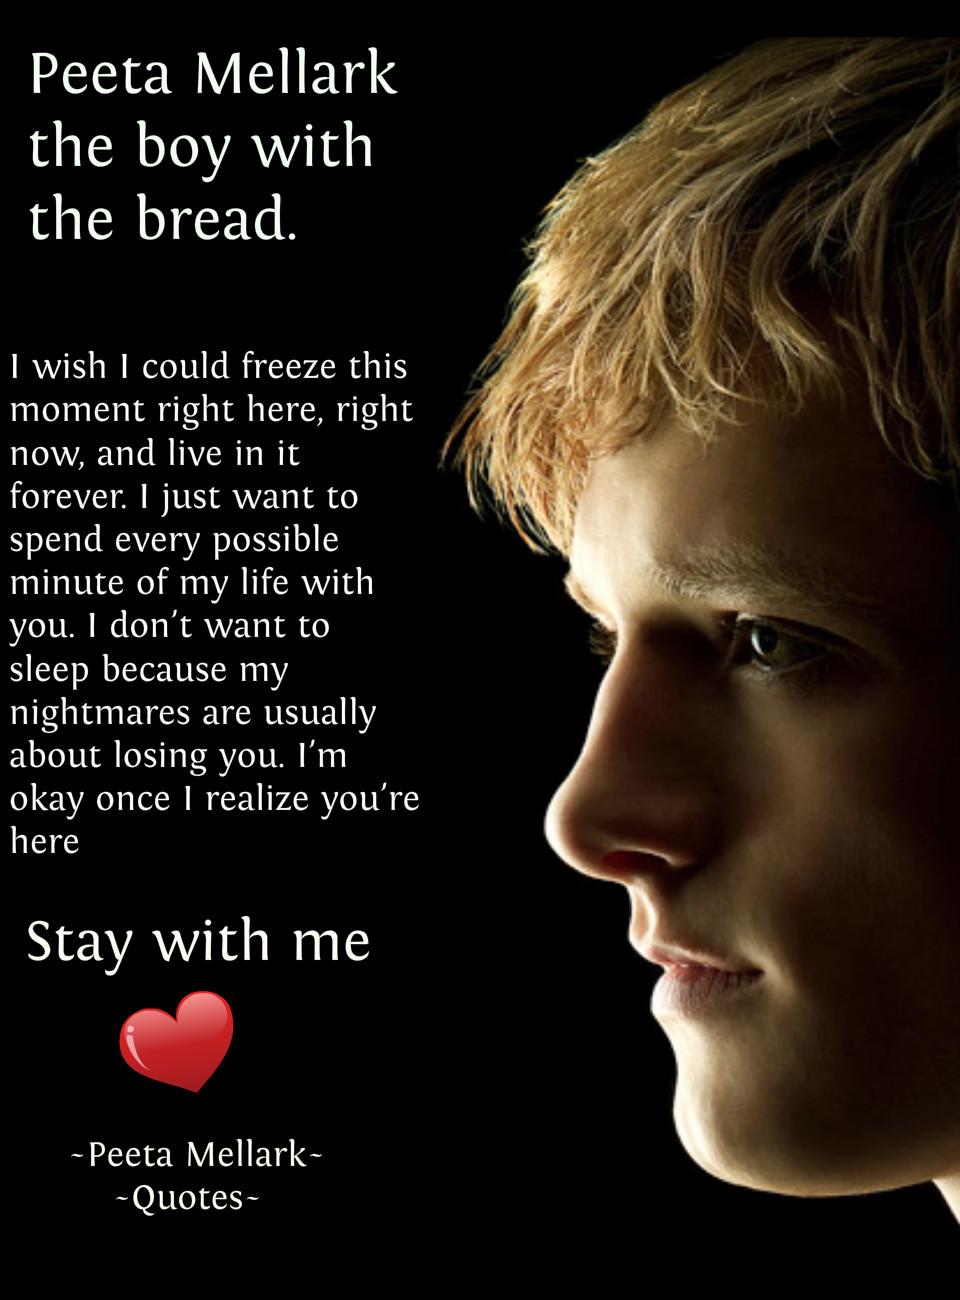 Peeta And Katniss Love Quotes. - 212.1KB